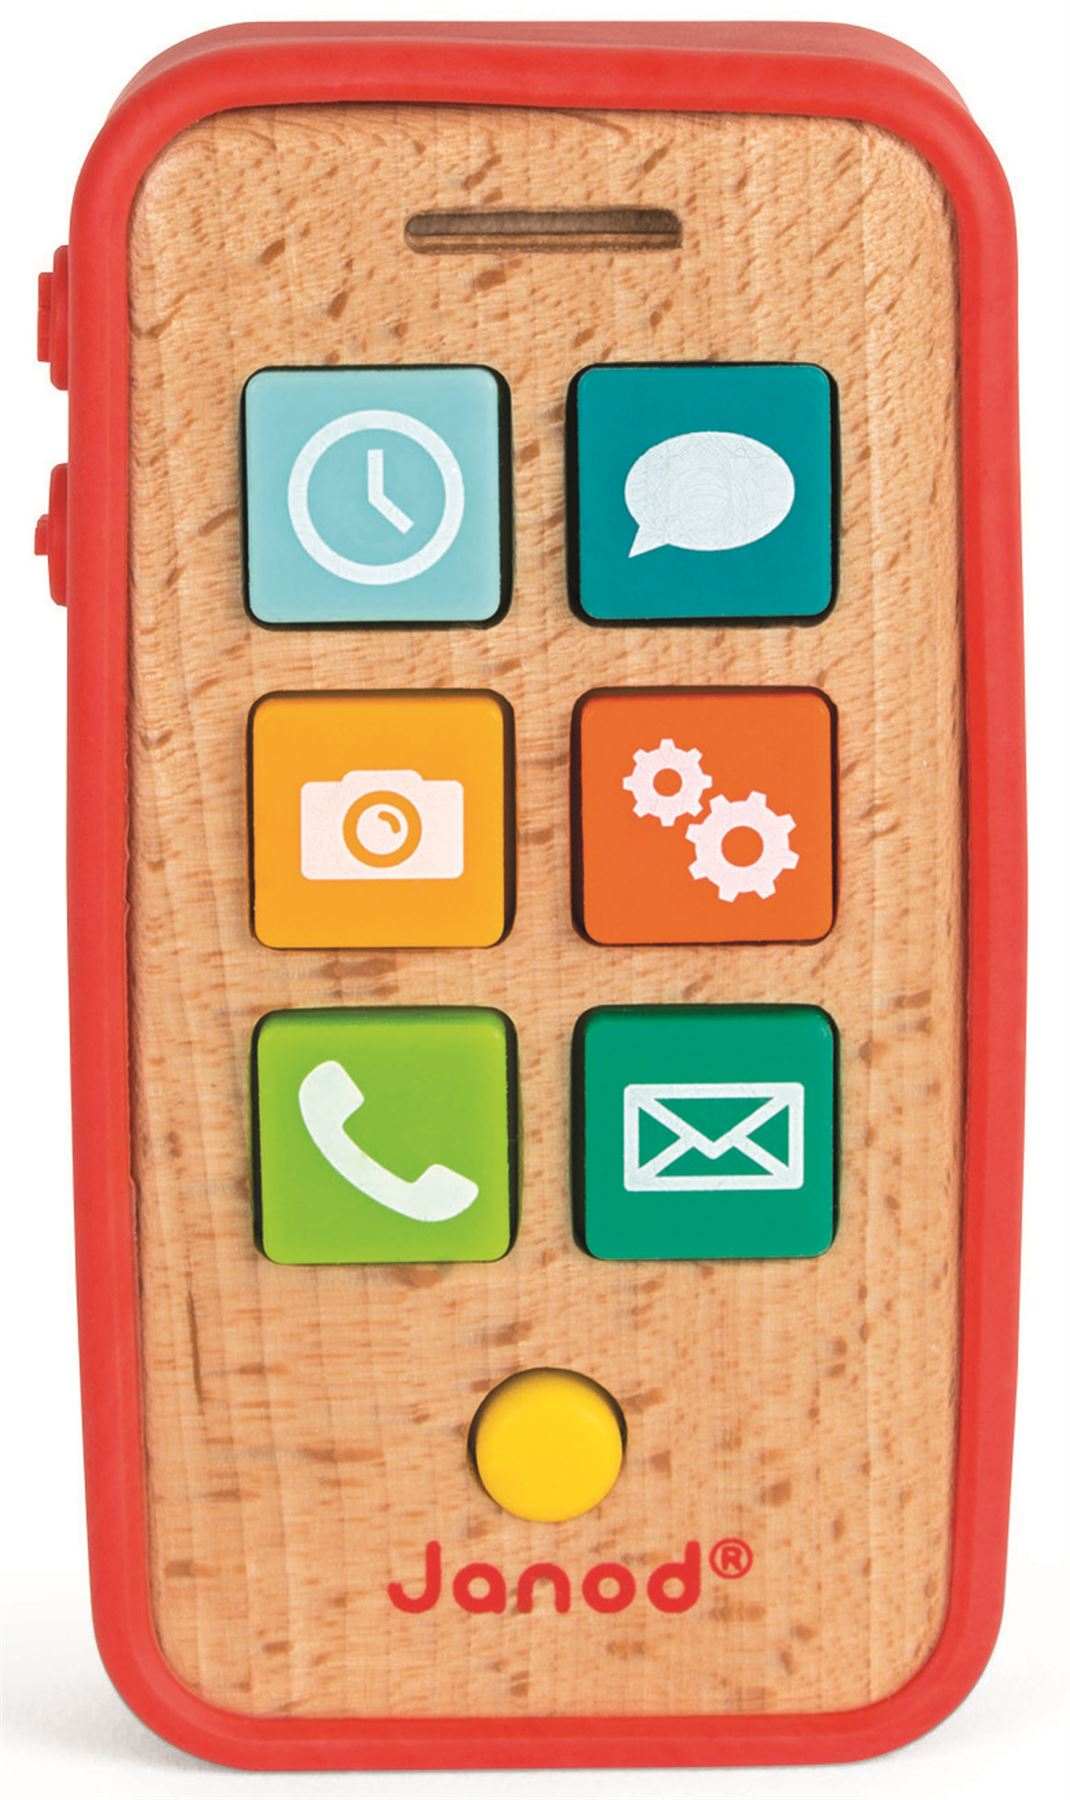 Janod PHONE Wooden Toys Games Preschool BN